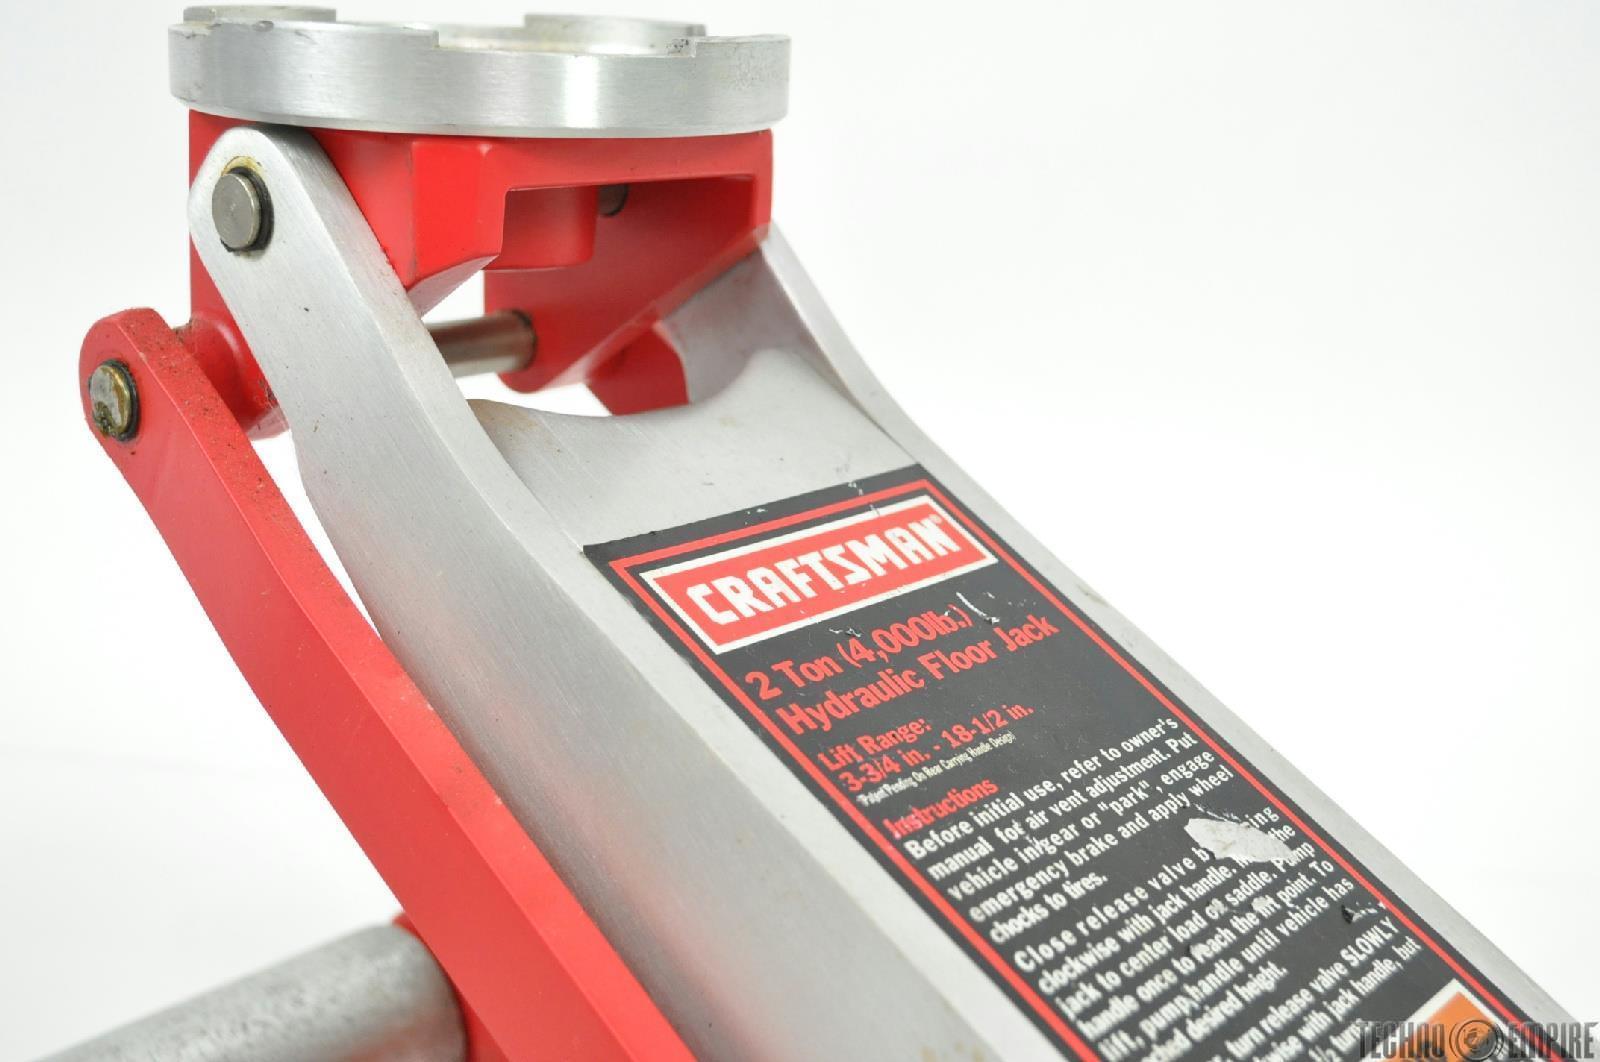 Craftsman 2 Ton Floor Jack Model 21412400